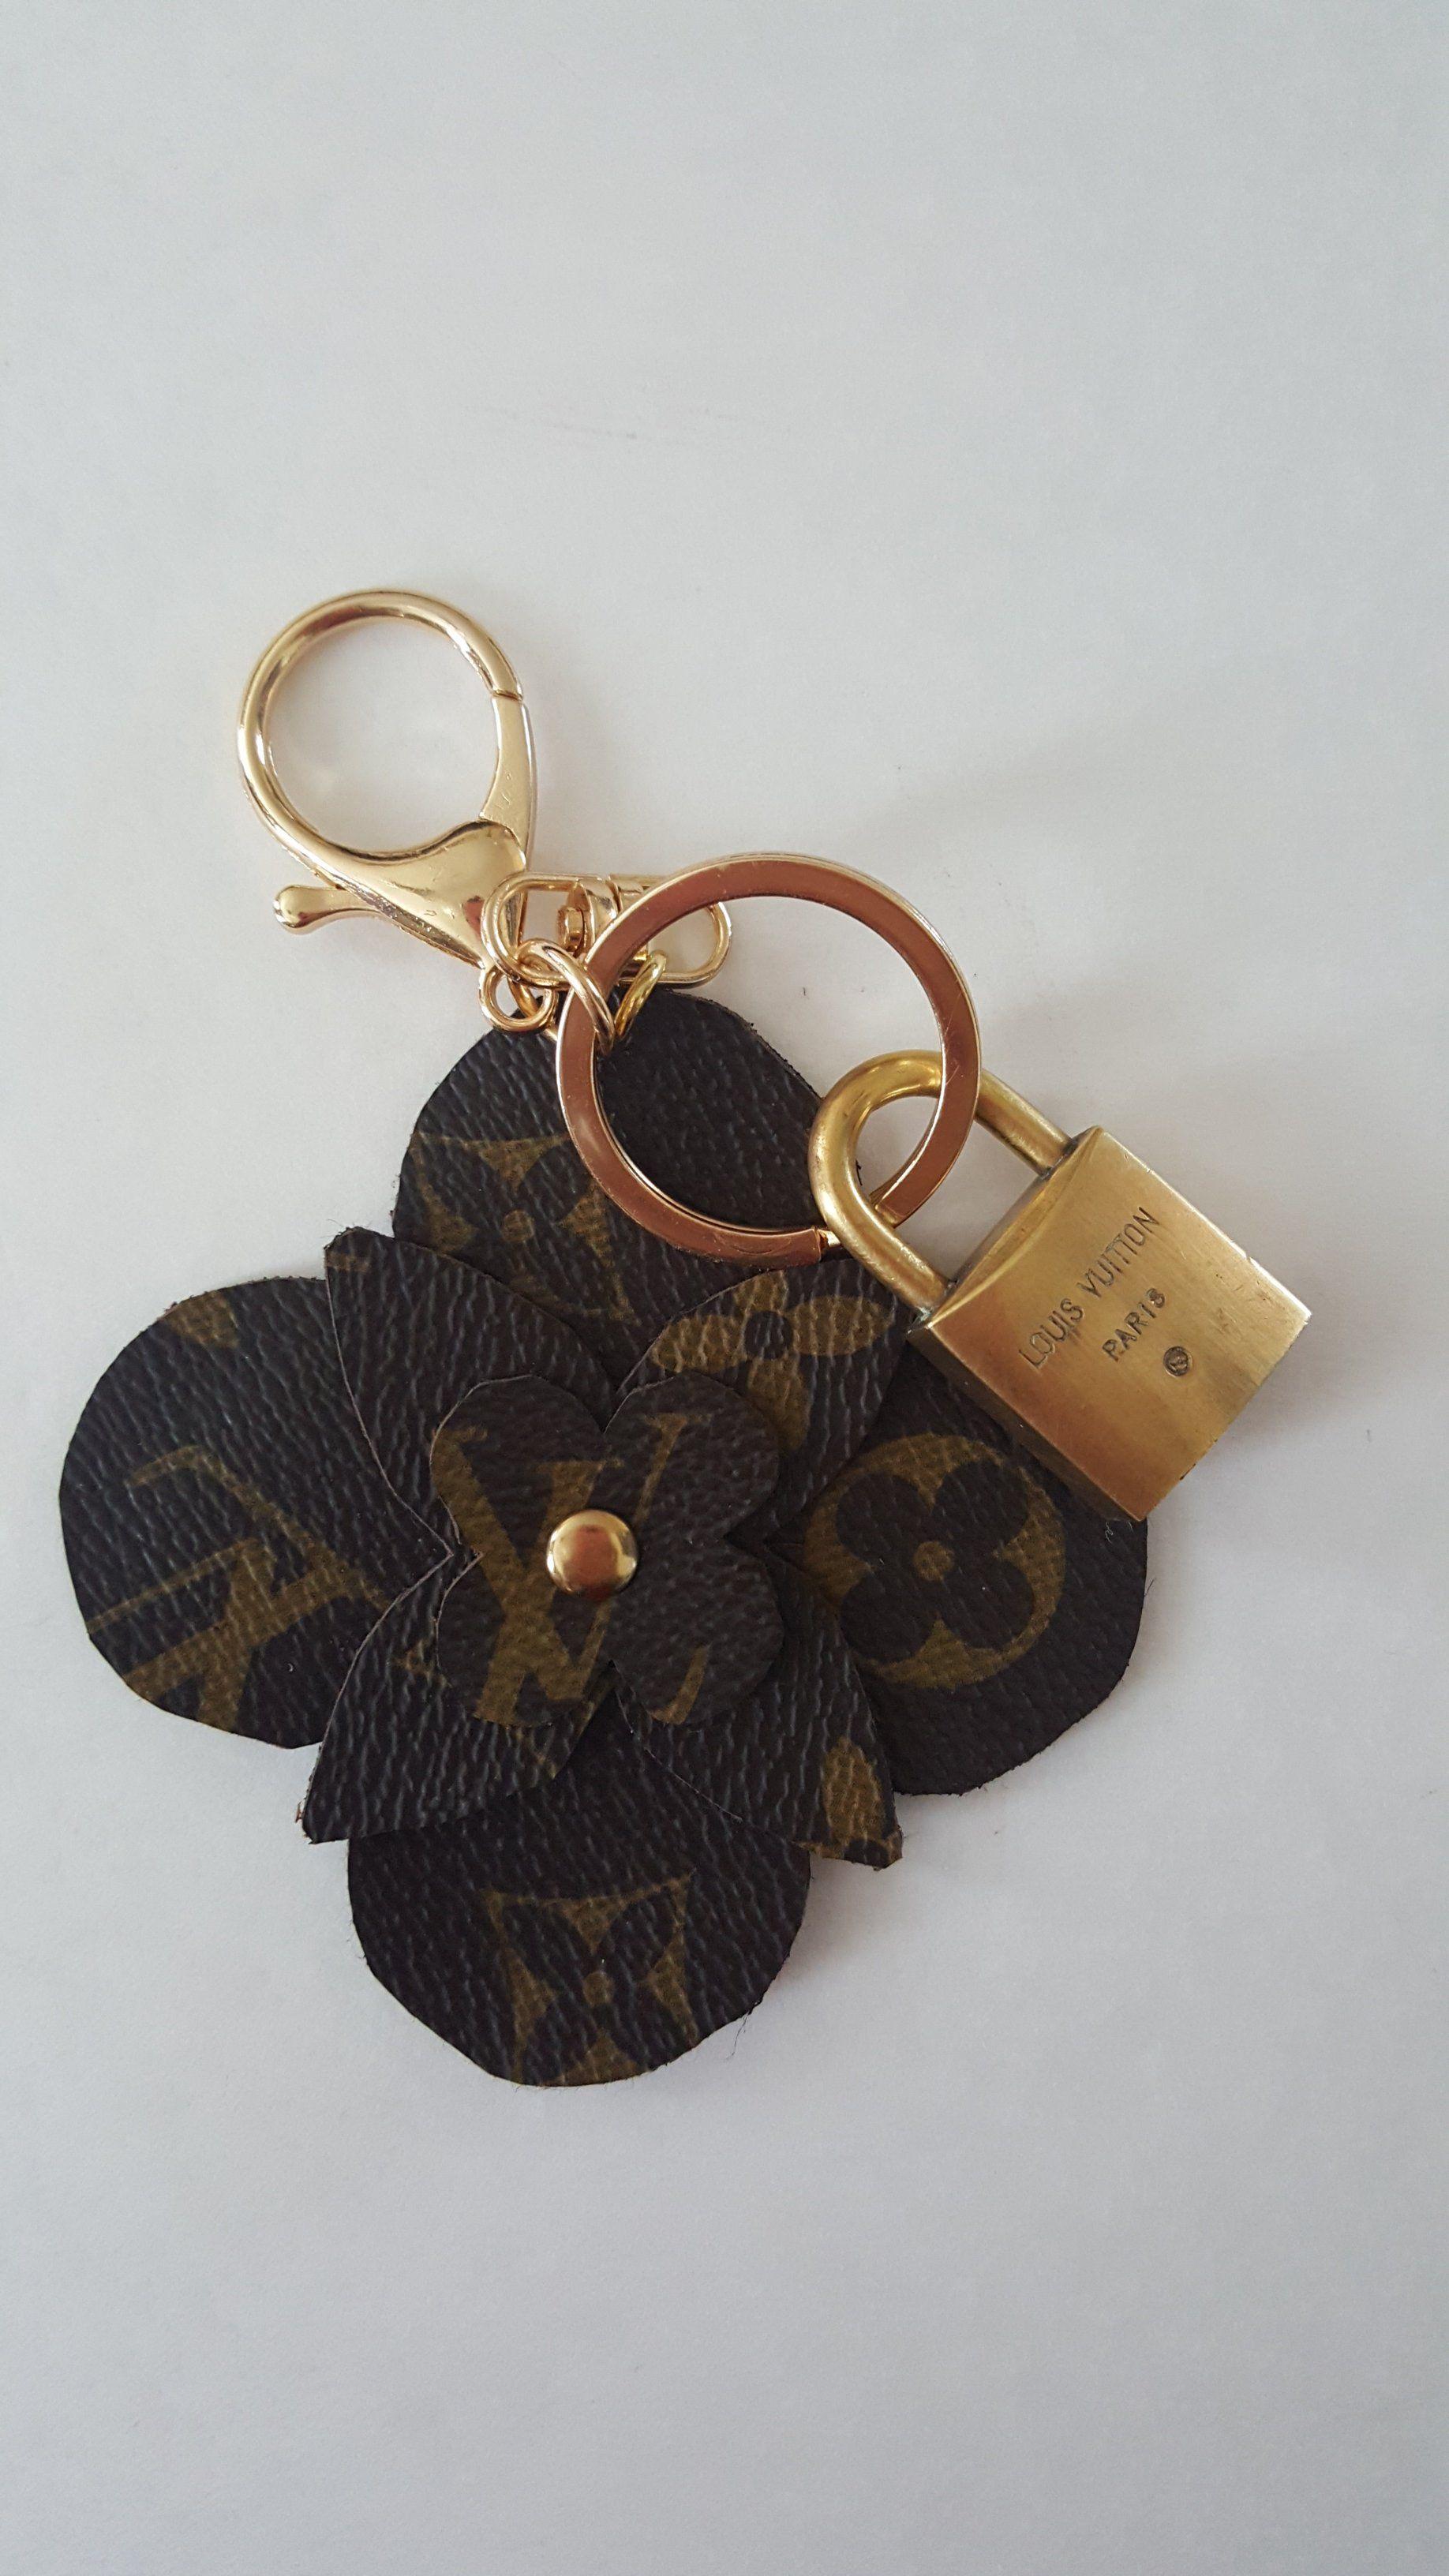 Louis vuitton reworked bag charm key ring w vintage